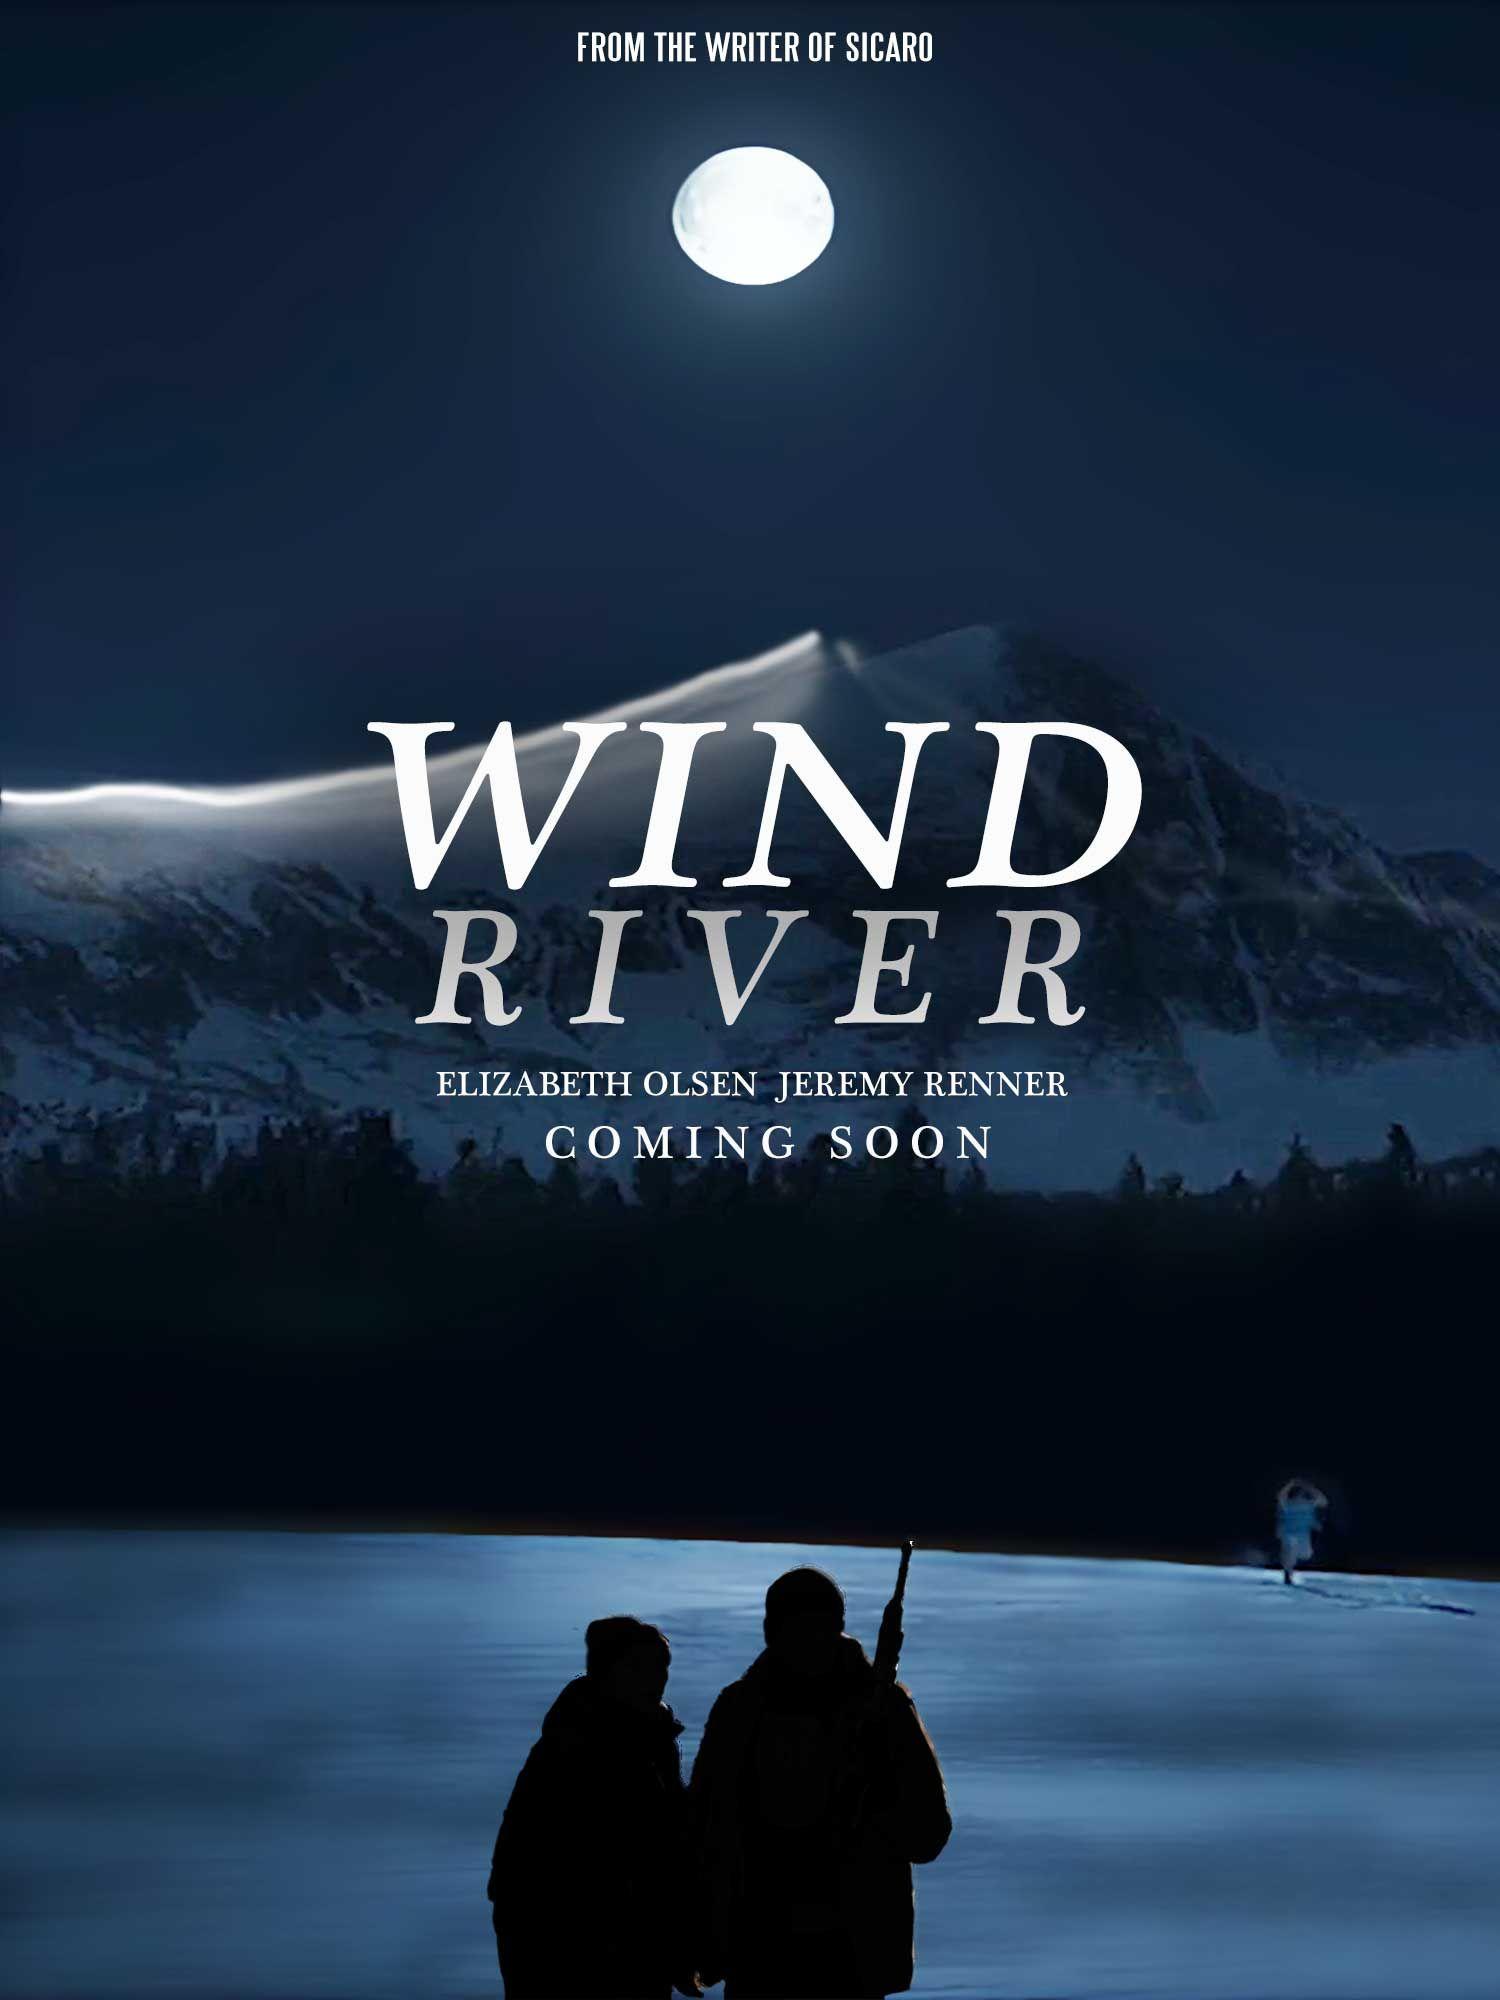 wind river full movie online free english subtitles